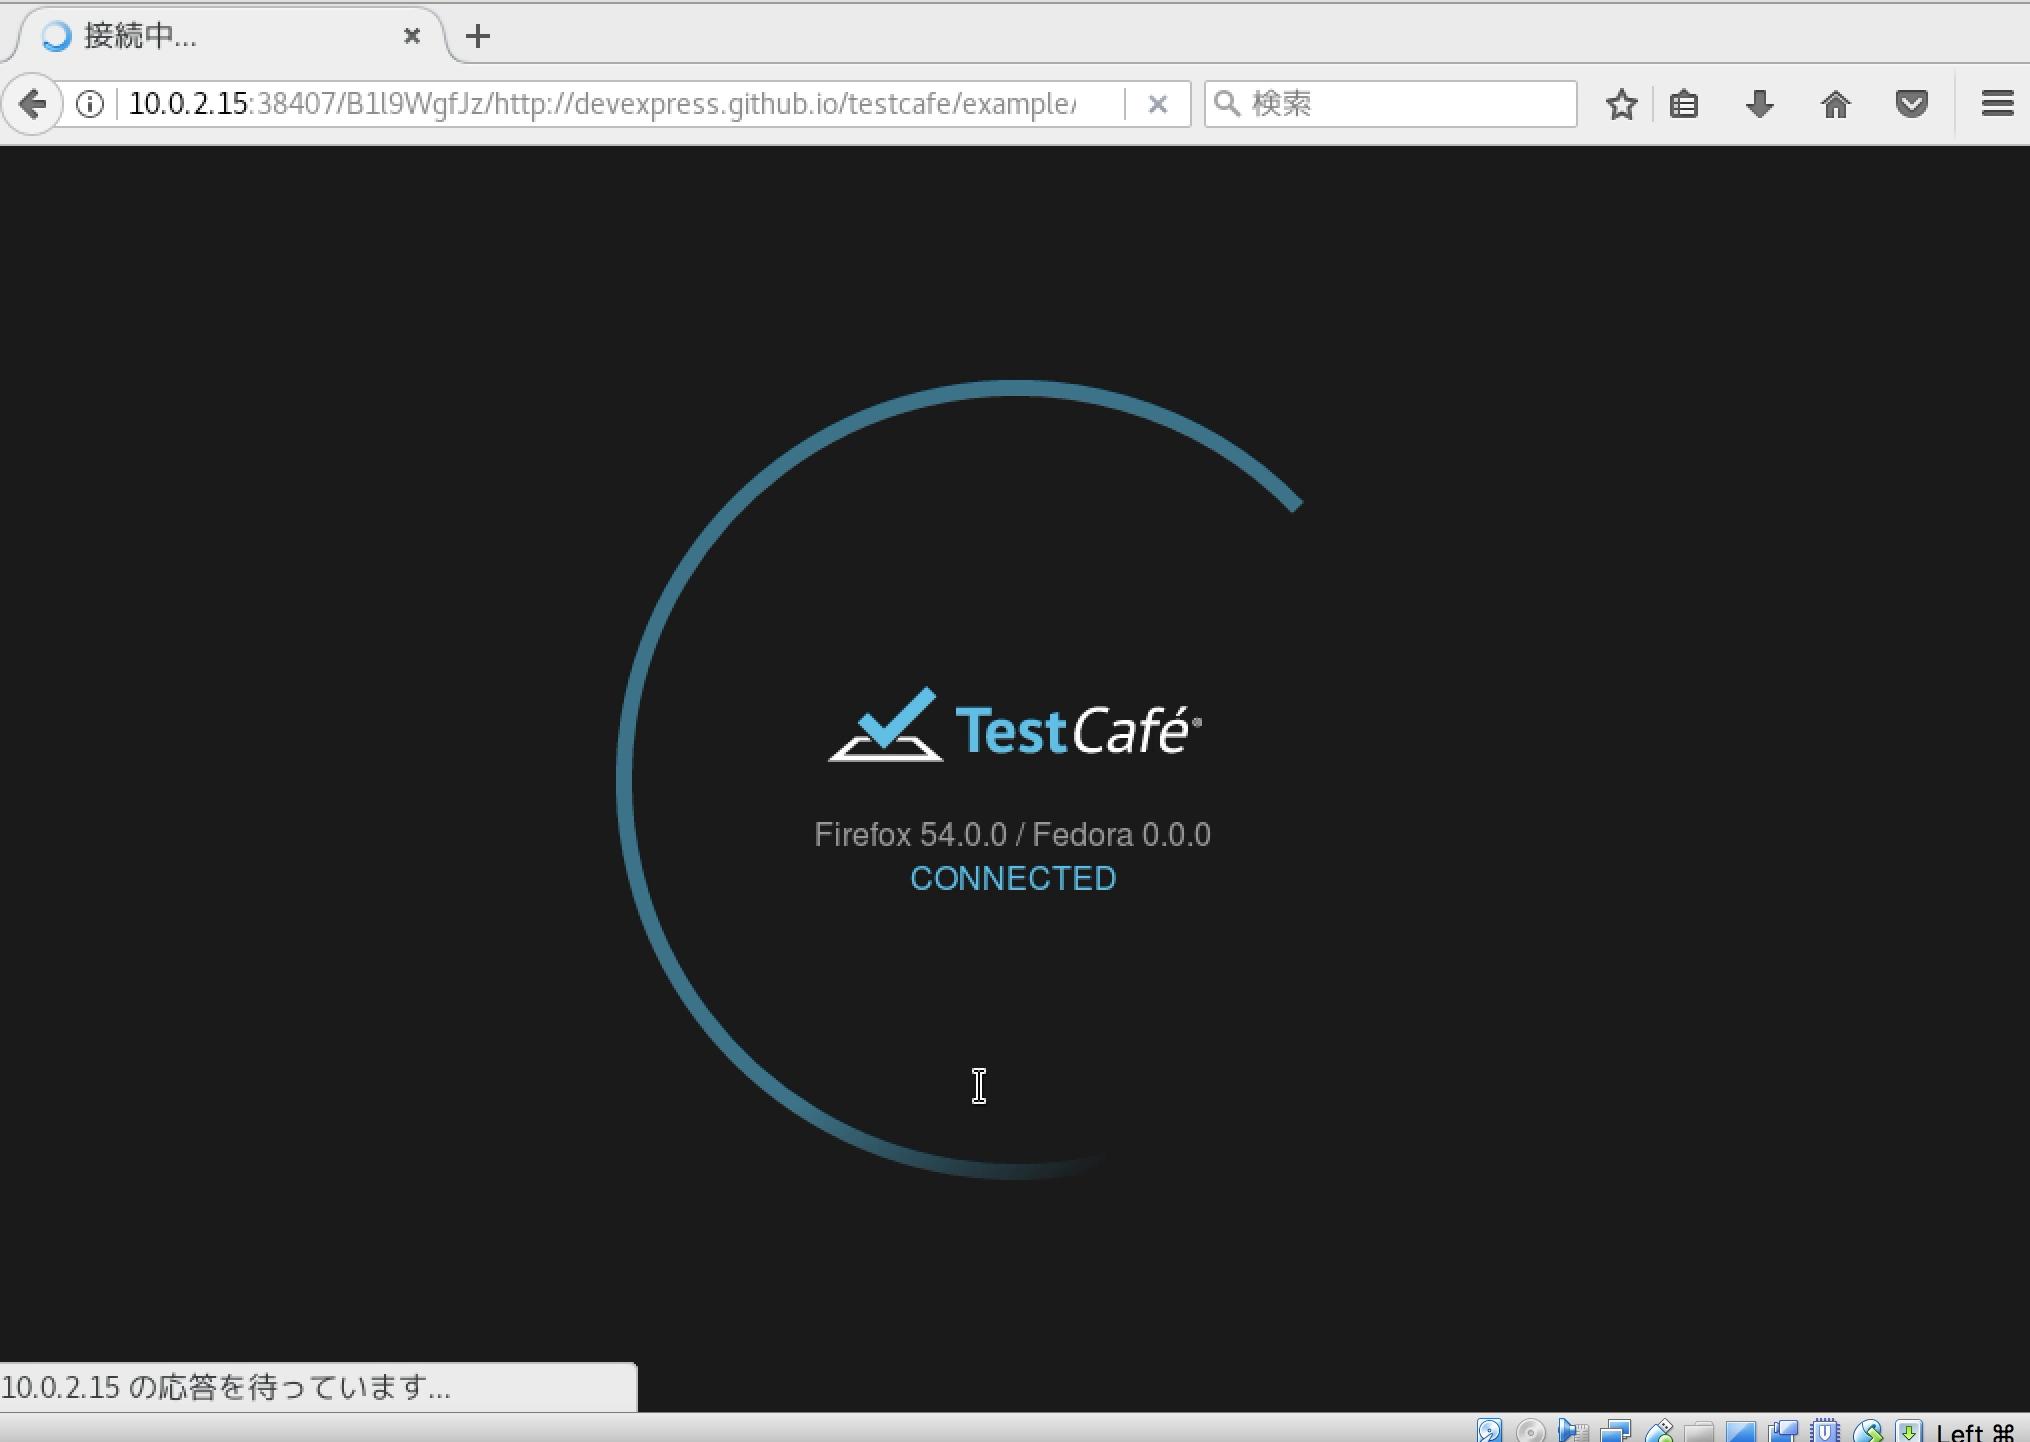 testcafe.png